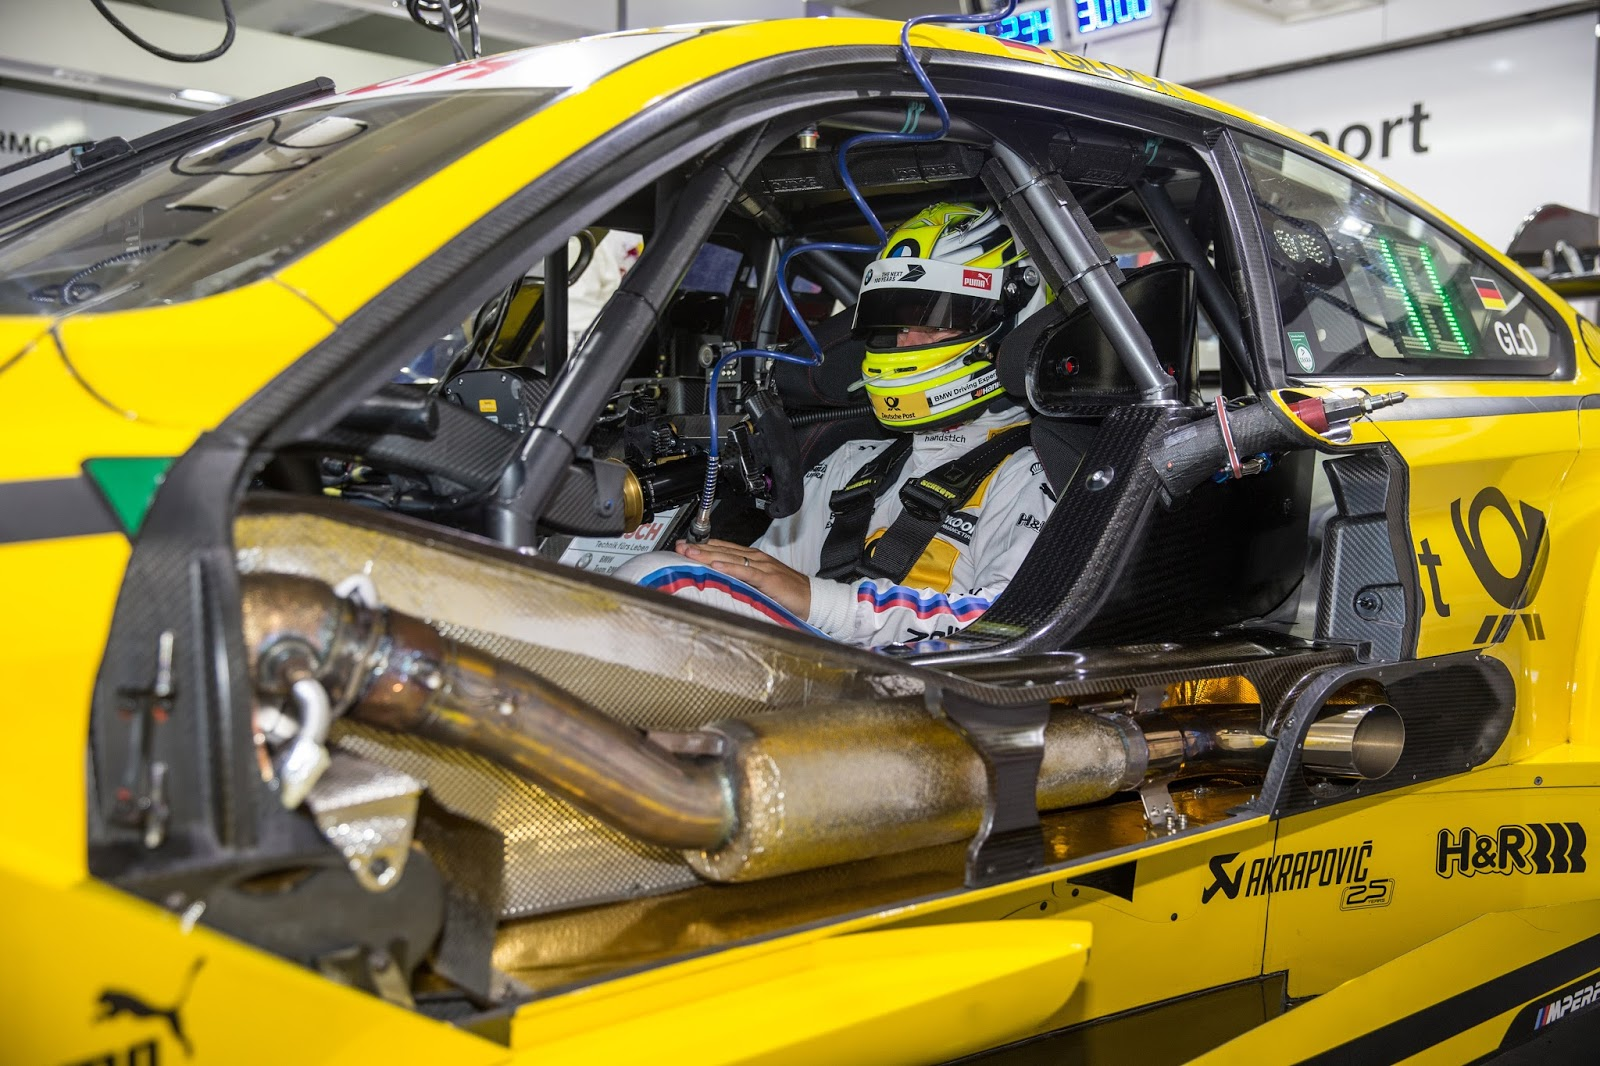 P90220568 highRes munich de 26th may 2 BMW Motorsport και Akrapovič ενισχύουν την συνεργασία τους